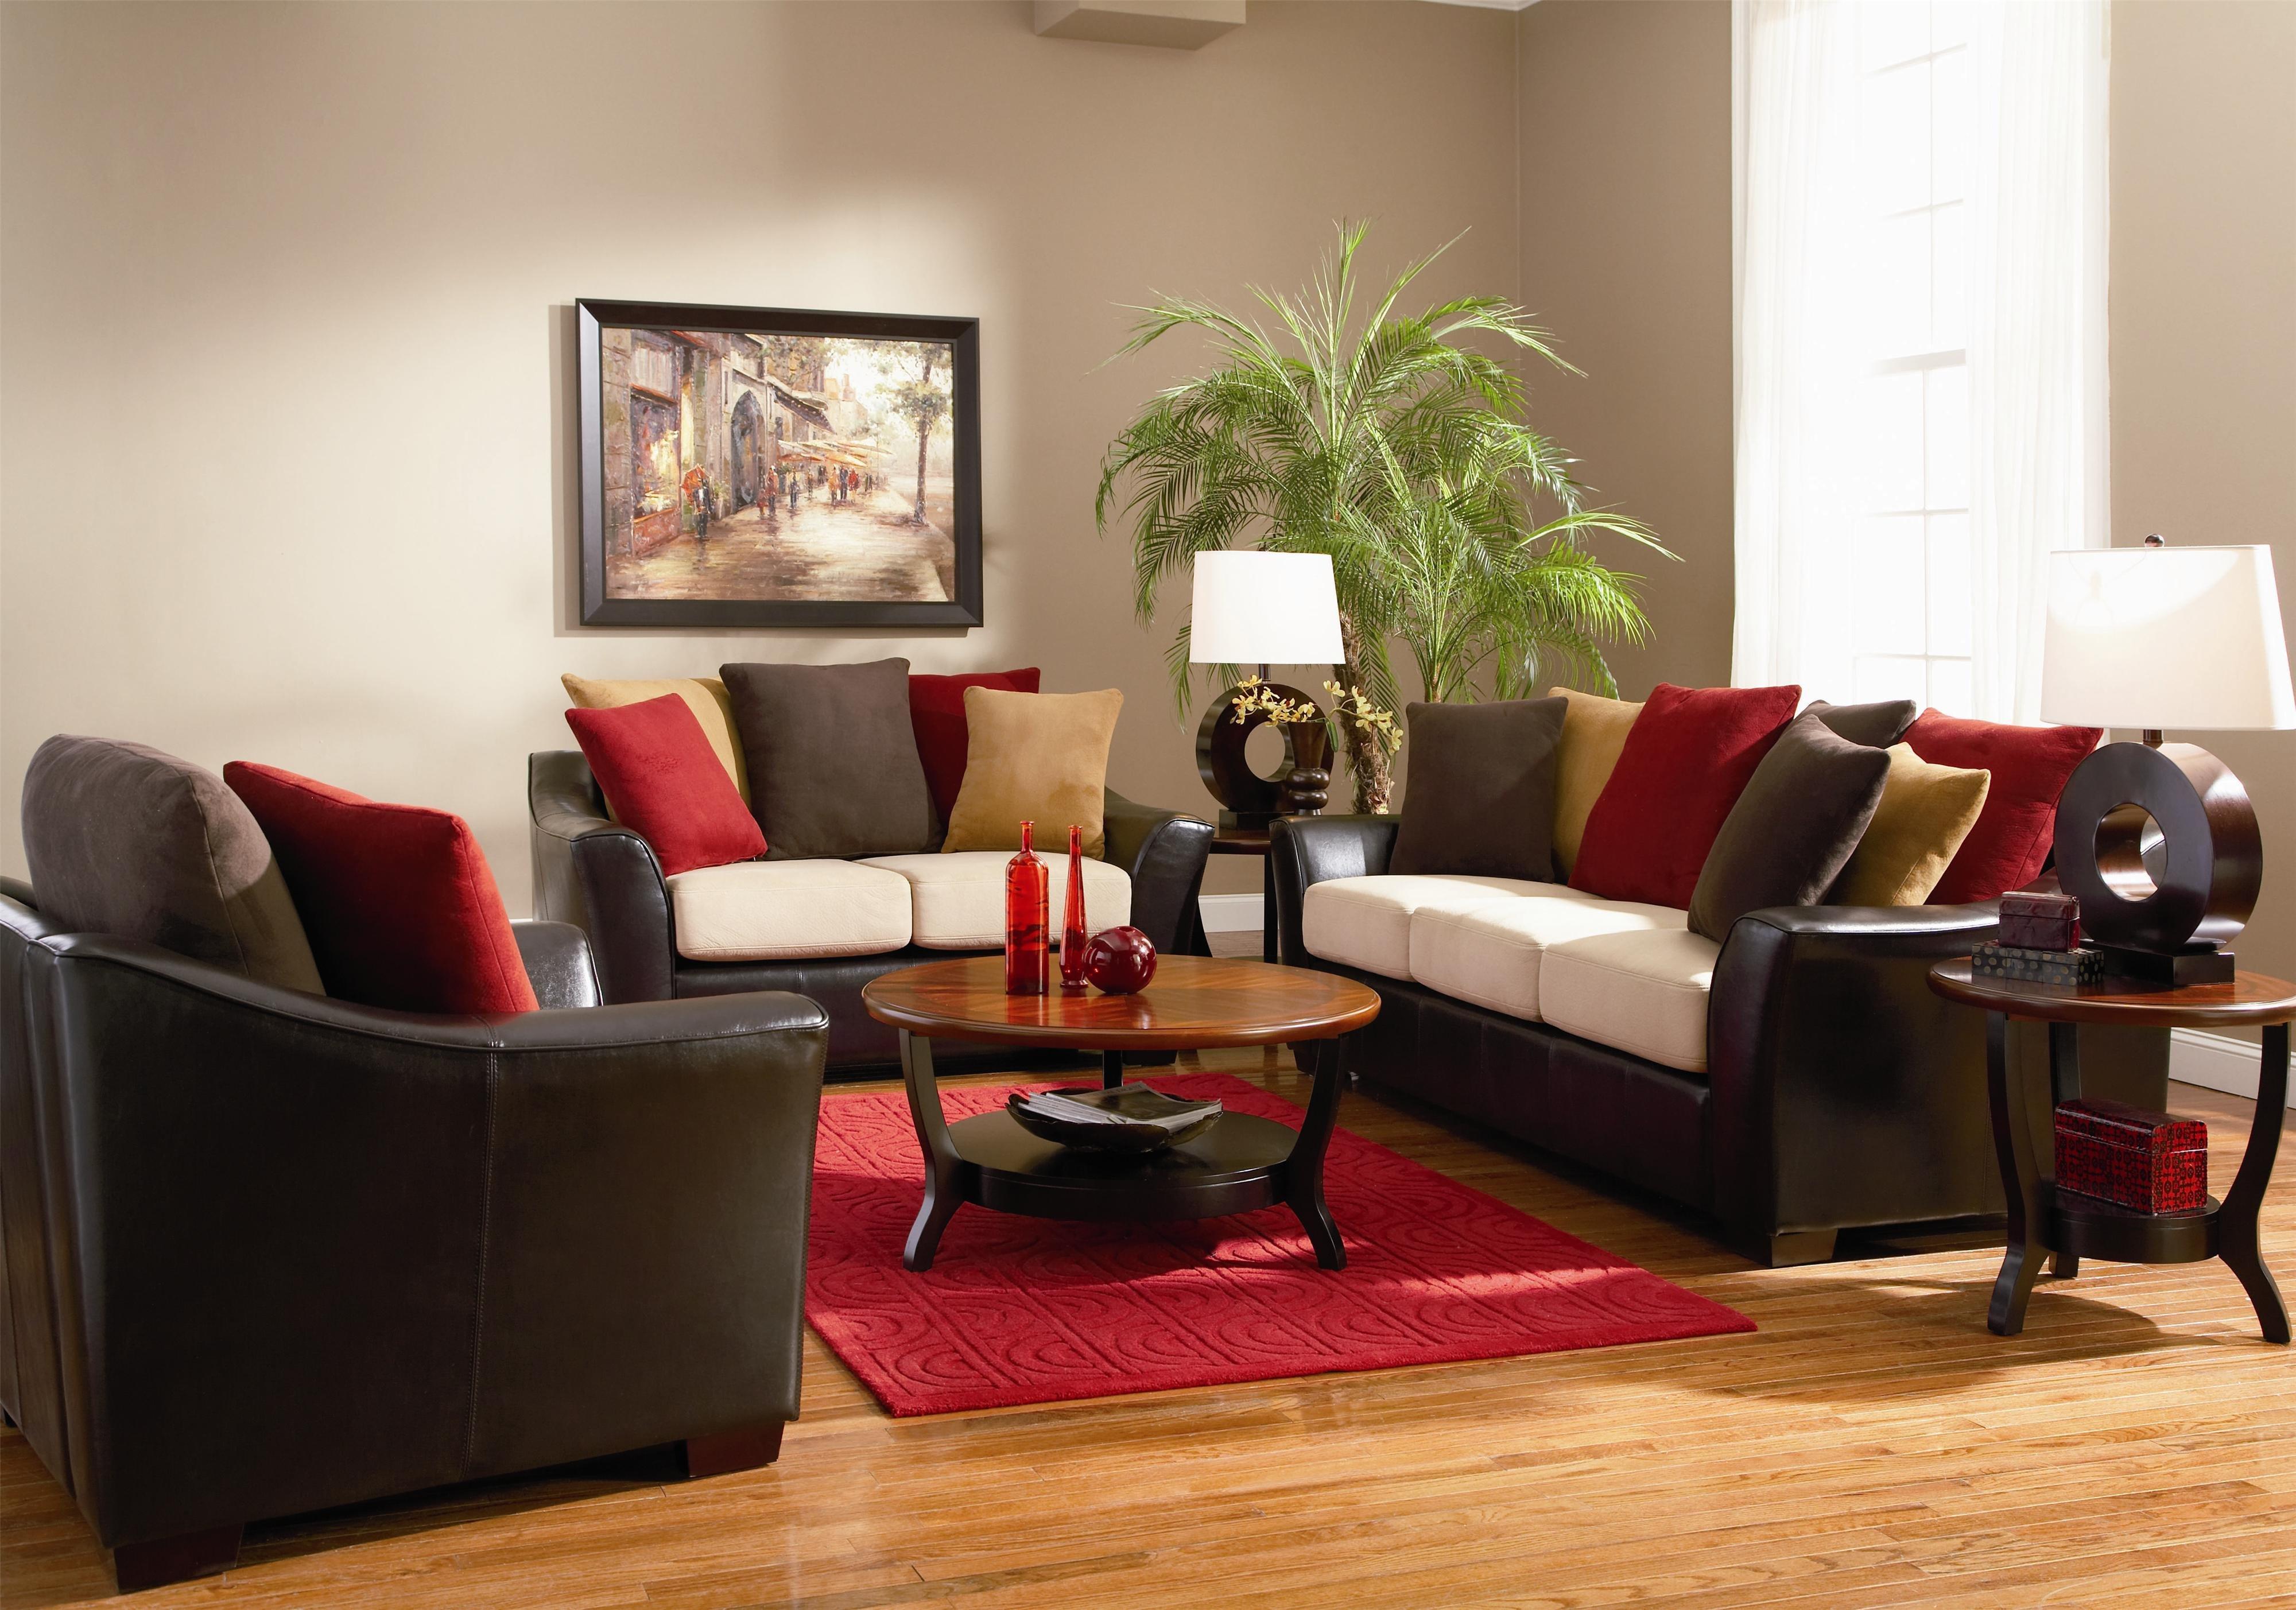 Living Room Furniture Ideas New Black Furniture Living Room Ideas